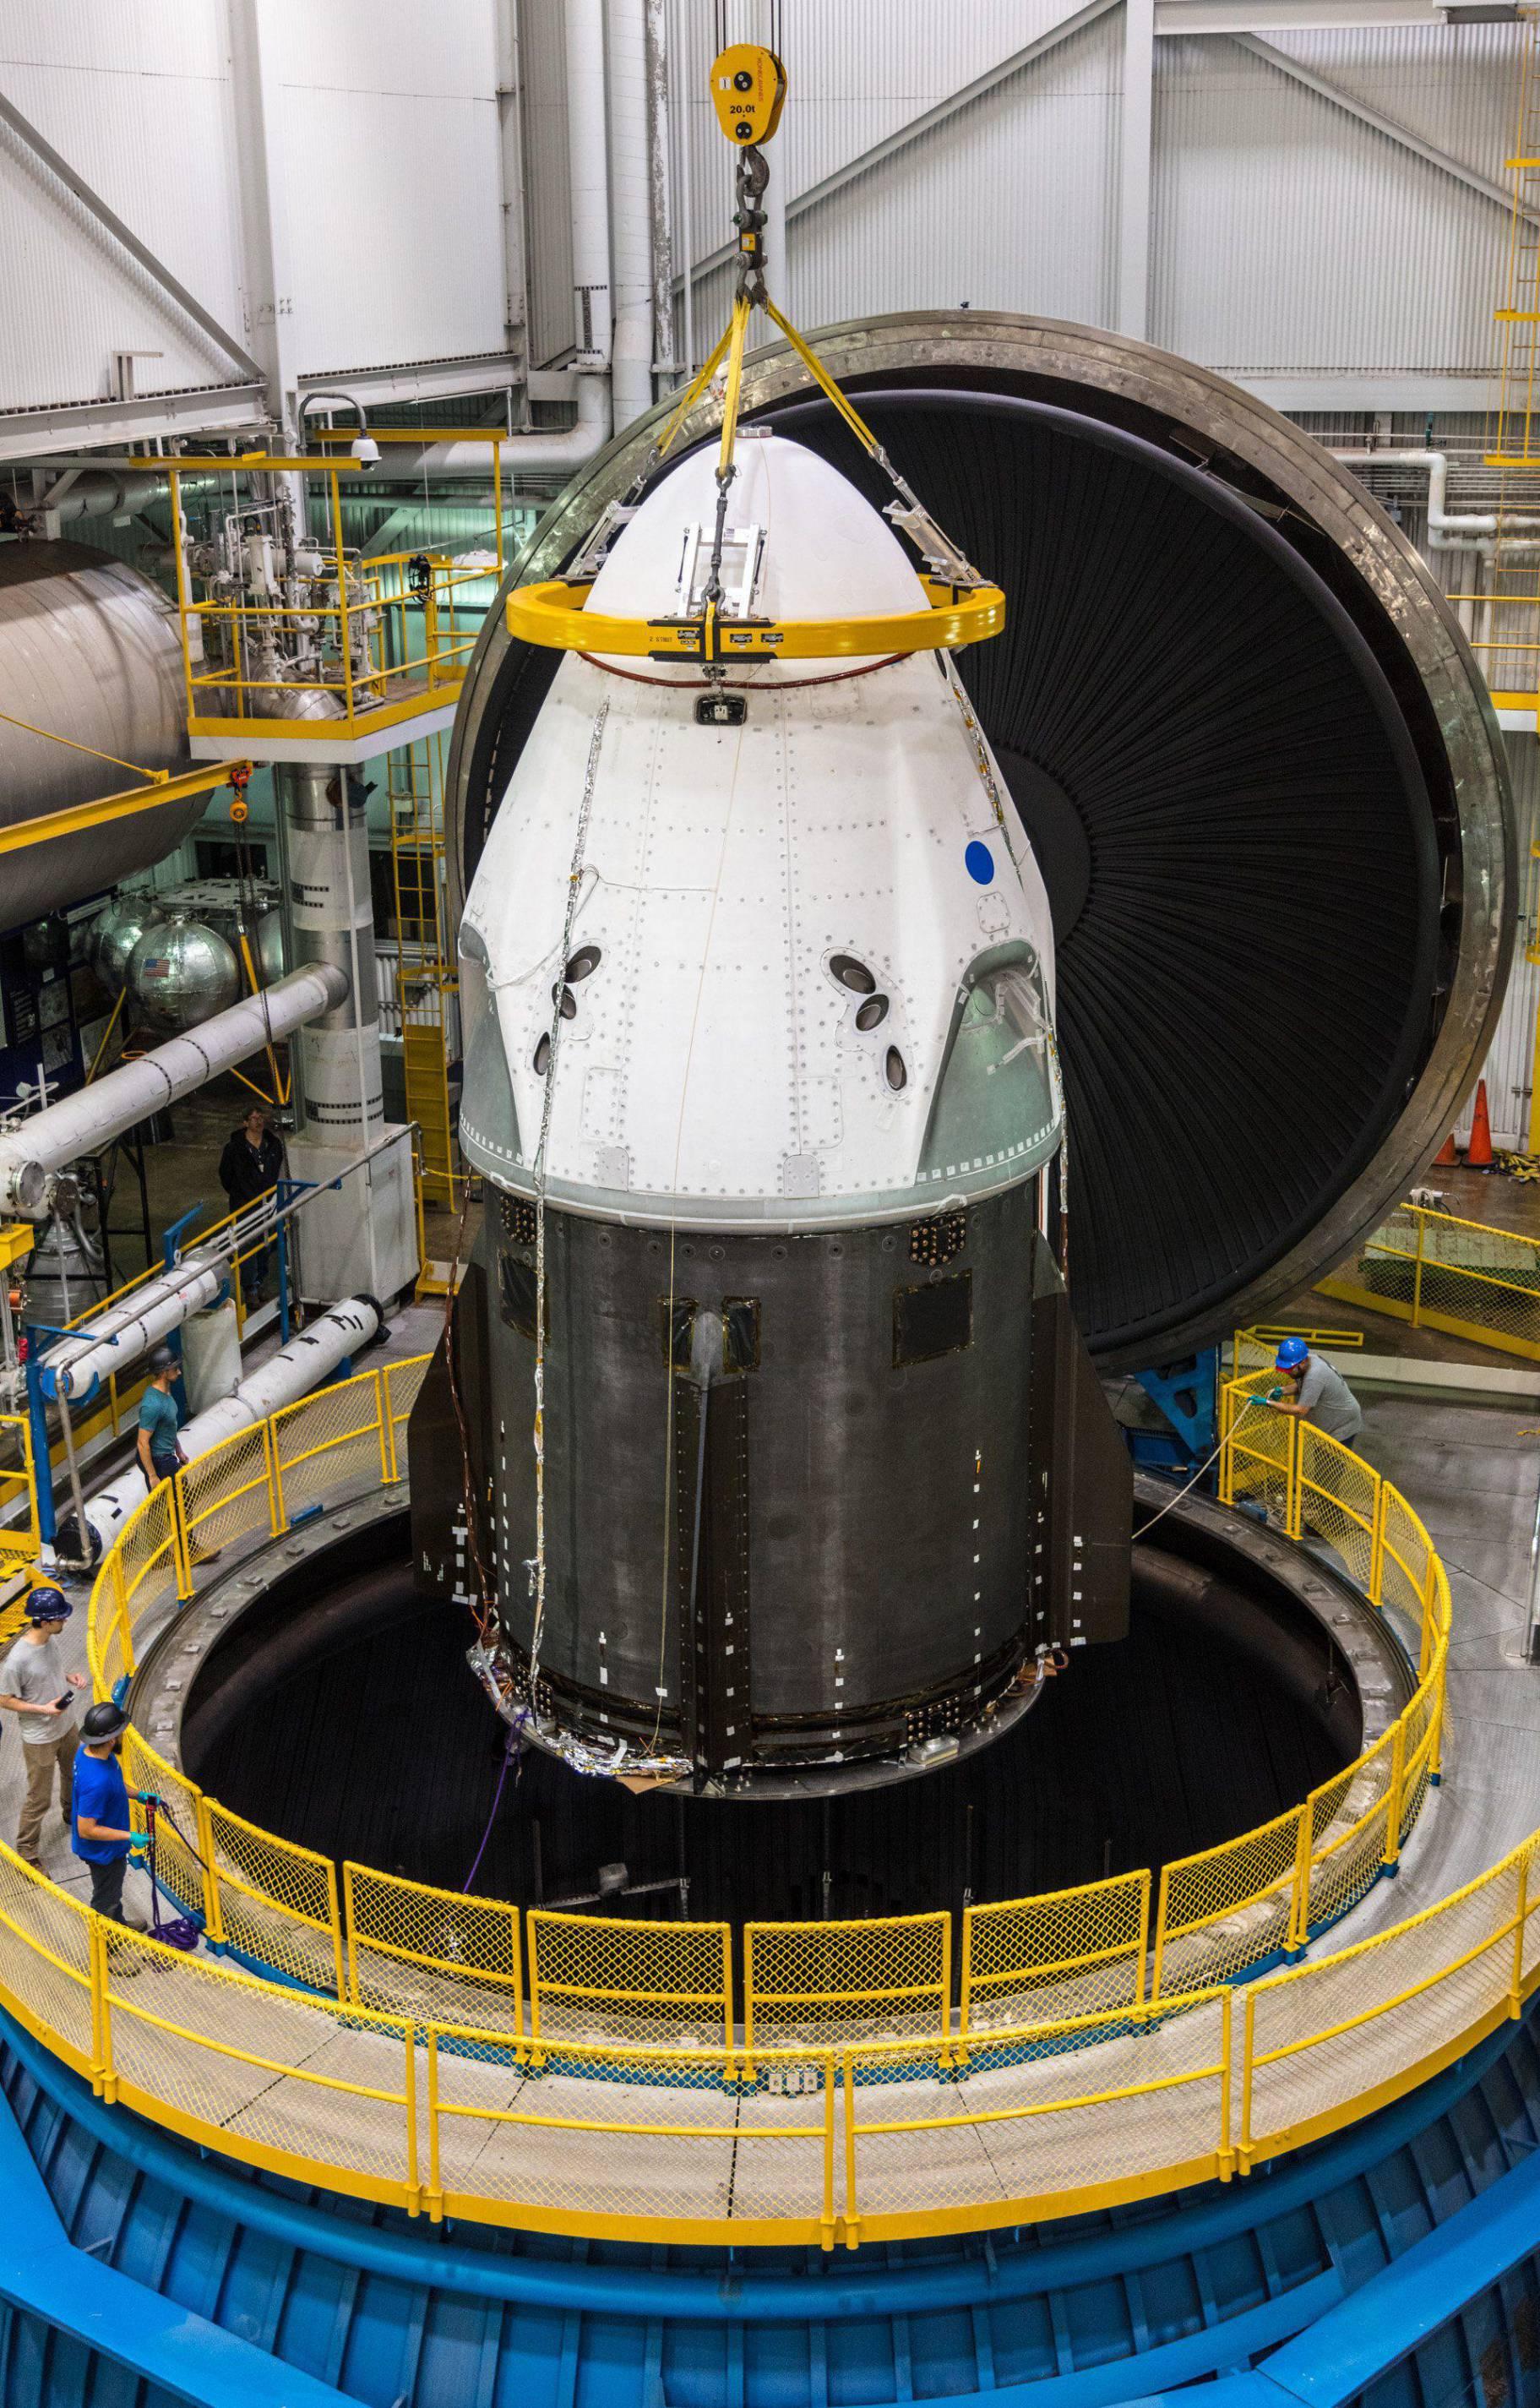 DM-1 at Plum Brooke June 2018 (SpaceX) twitter